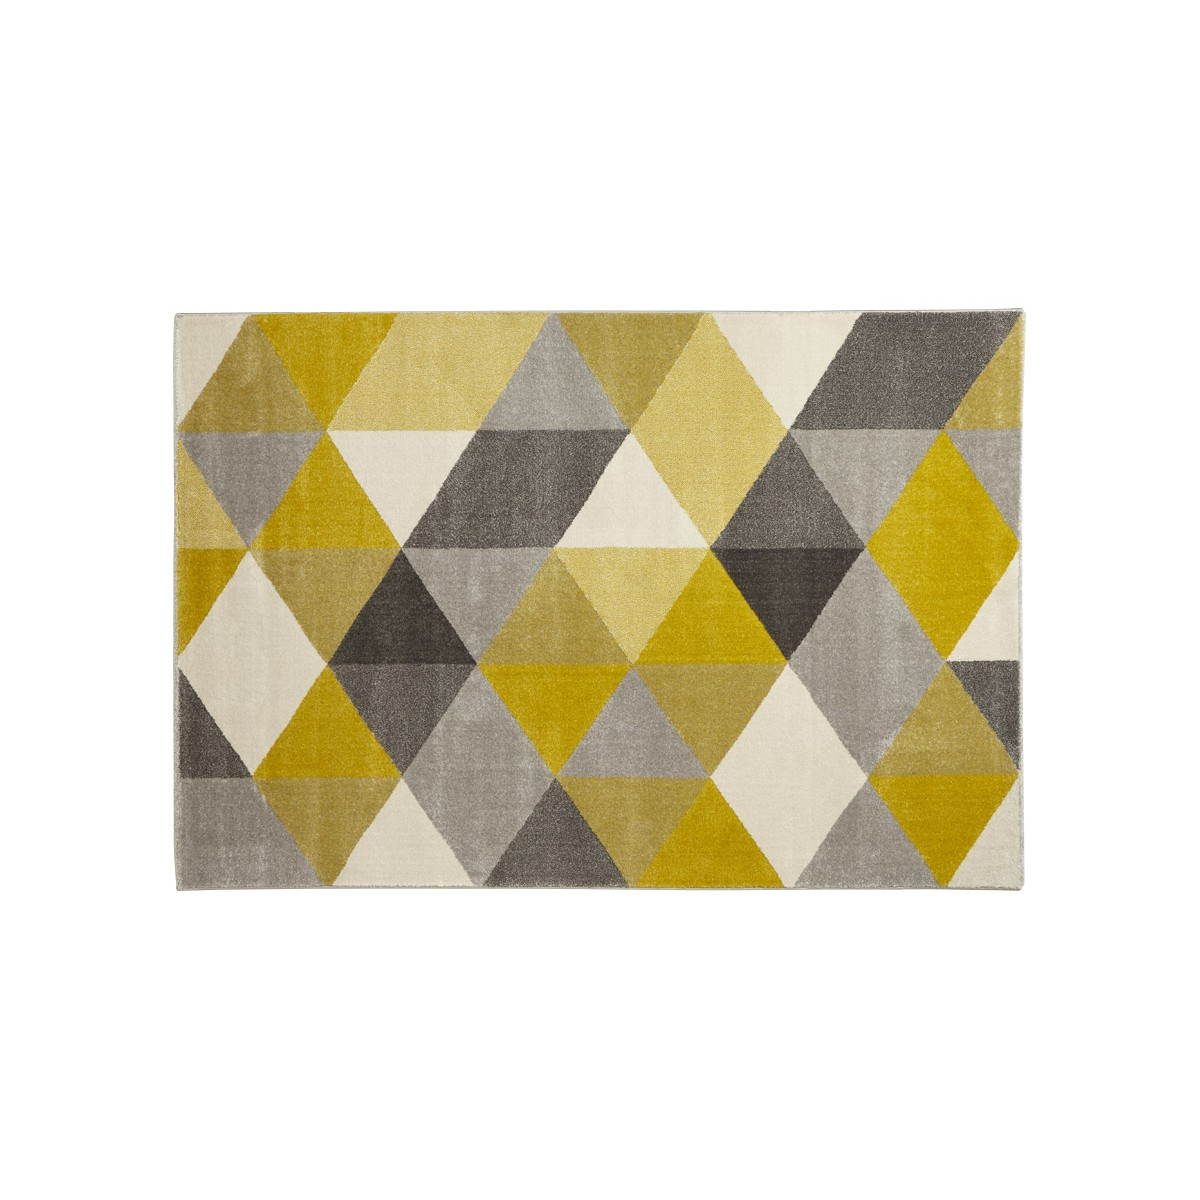 tapis design style scandinave rectangulaire geo 230cm x 160cm jaune gris beige amp story 3766